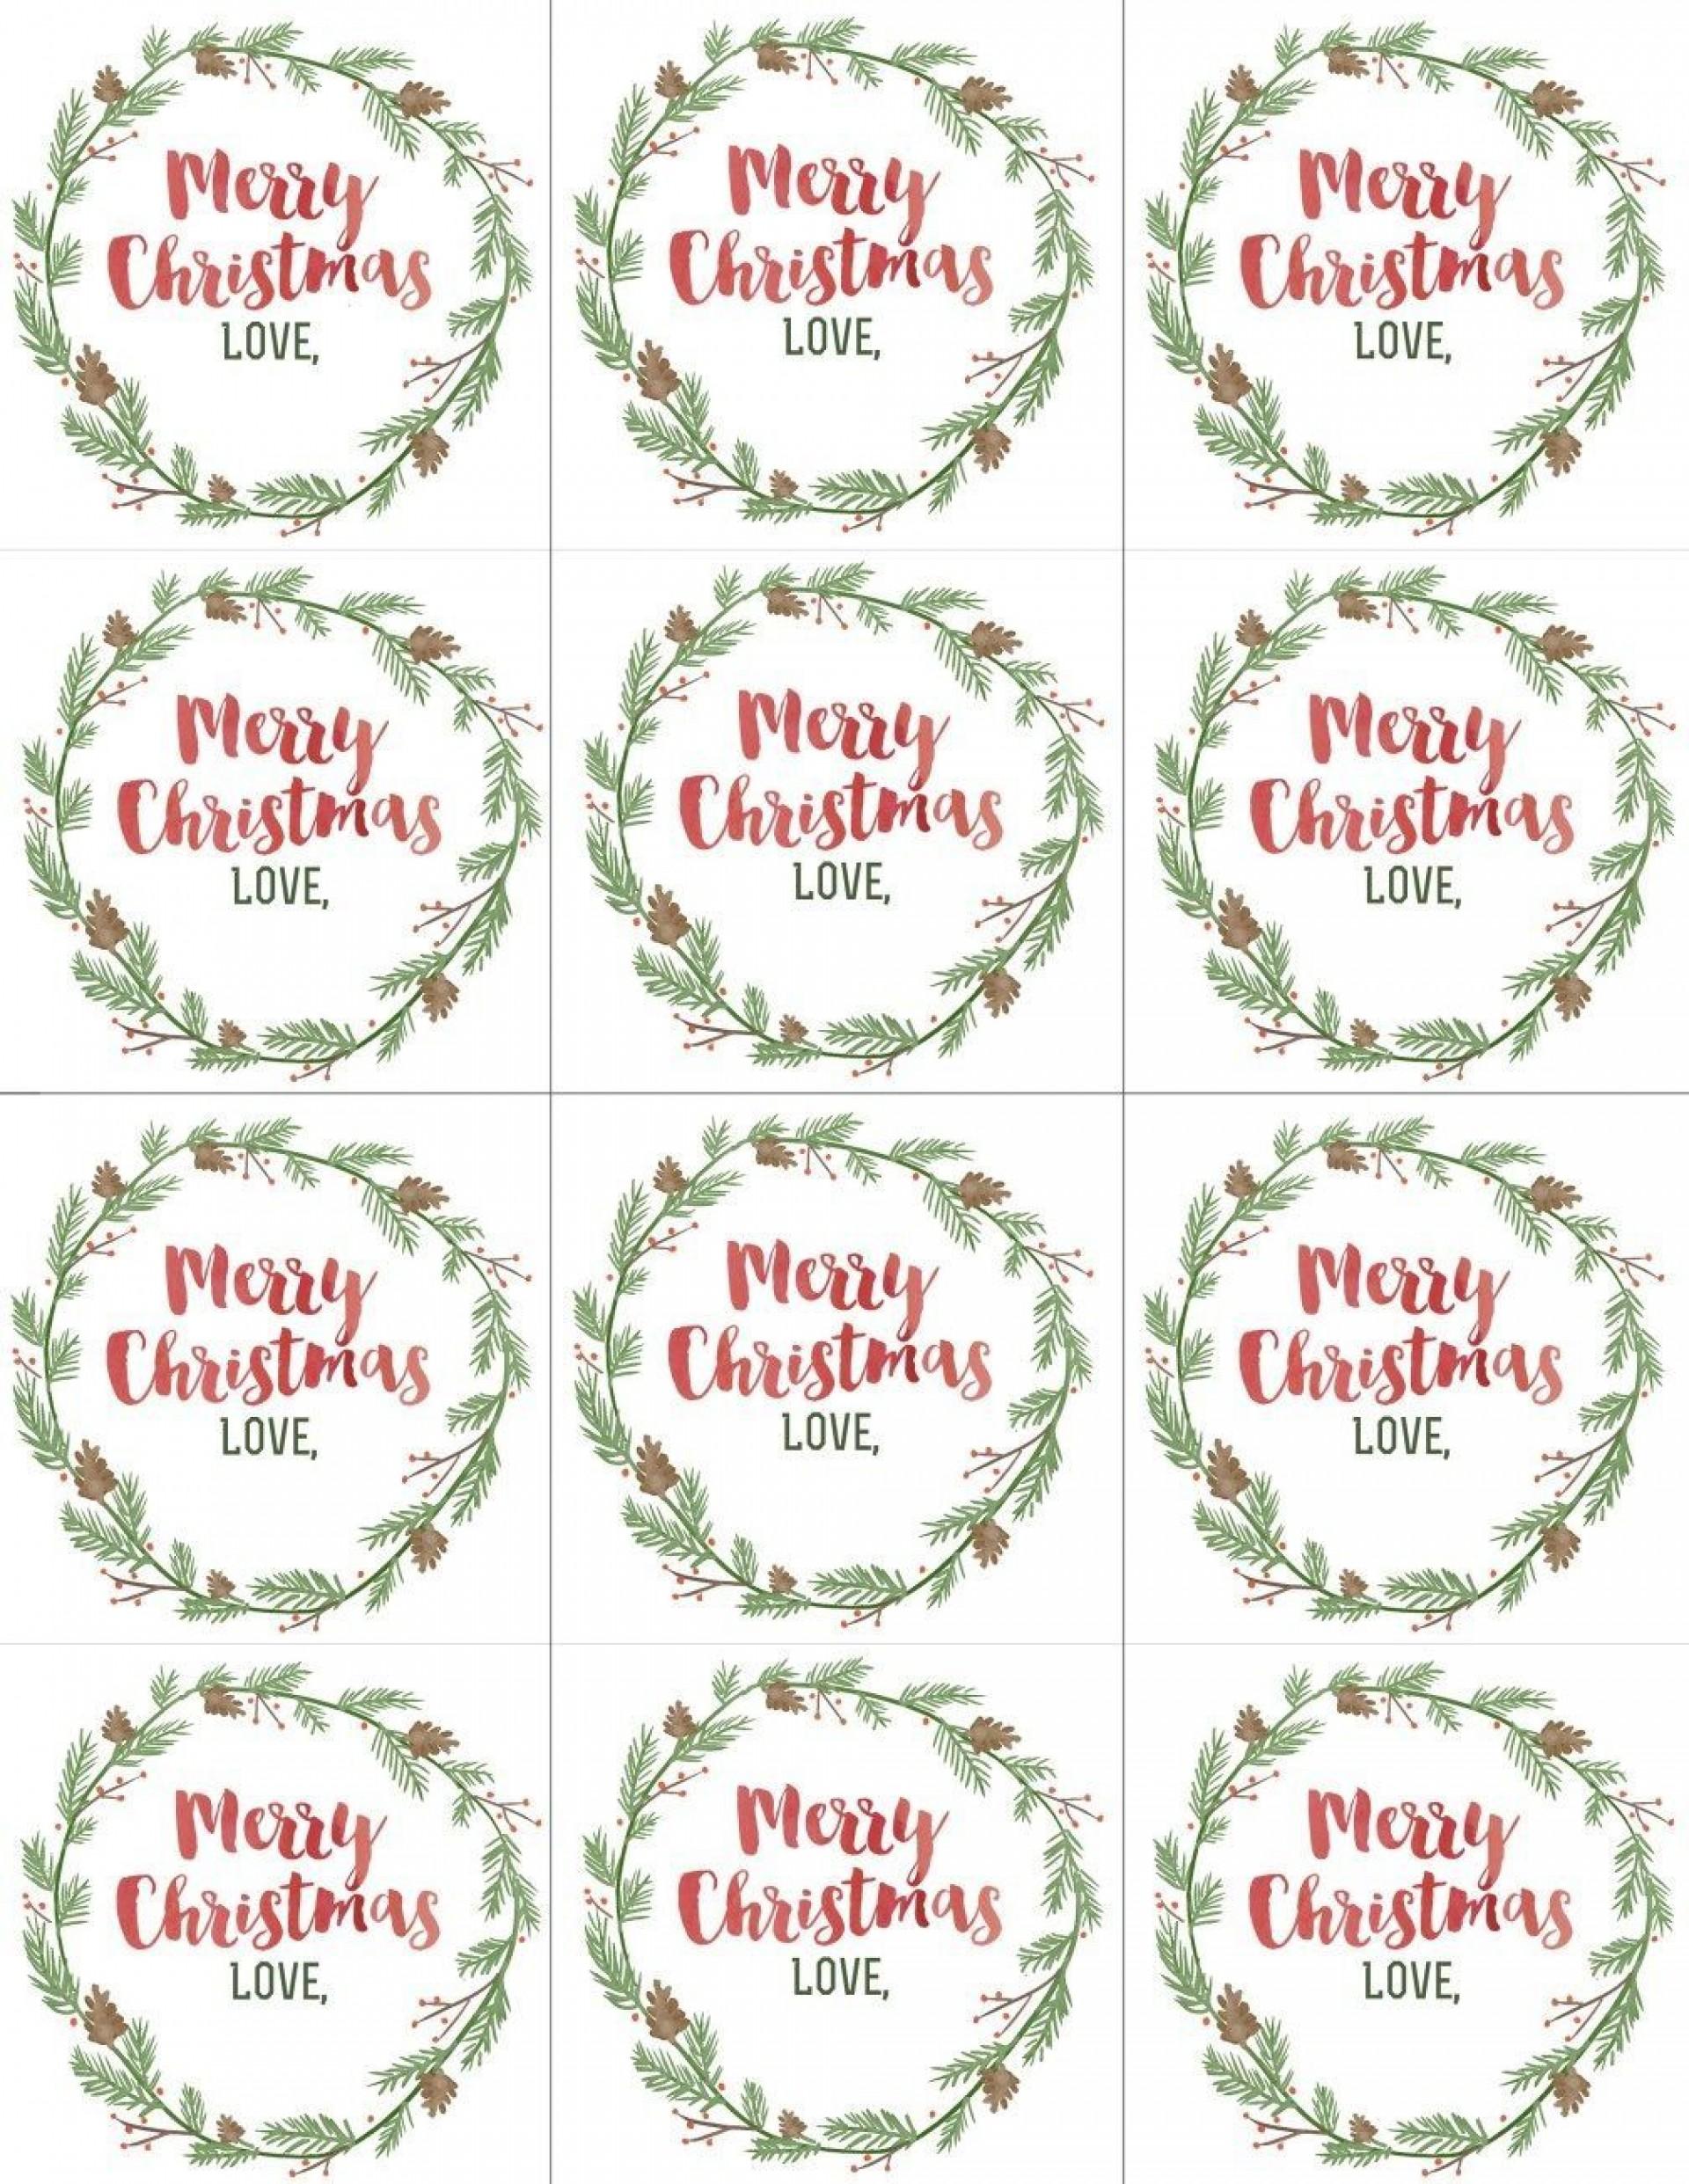 004 Wondrou Printable Christma Gift Tag Template Example  Templates Free Holiday For Word1920